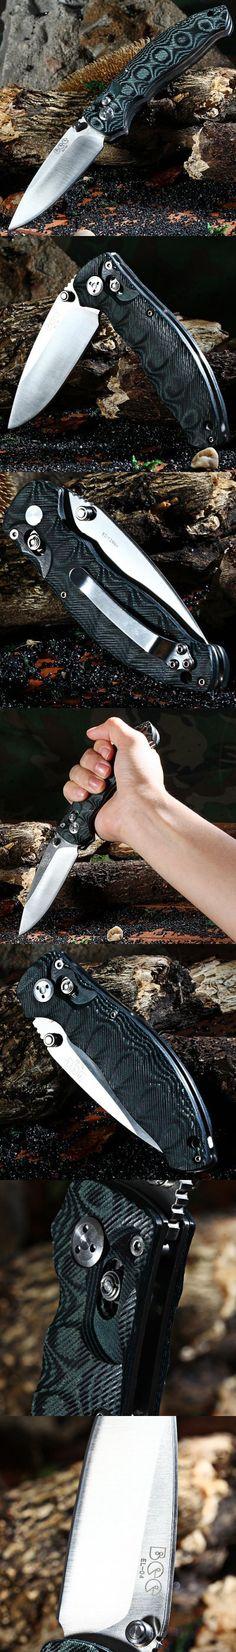 Pocket Knives and Folding Knives | Enlan Bee EL-04 MCT Axis Lock Folding Knife